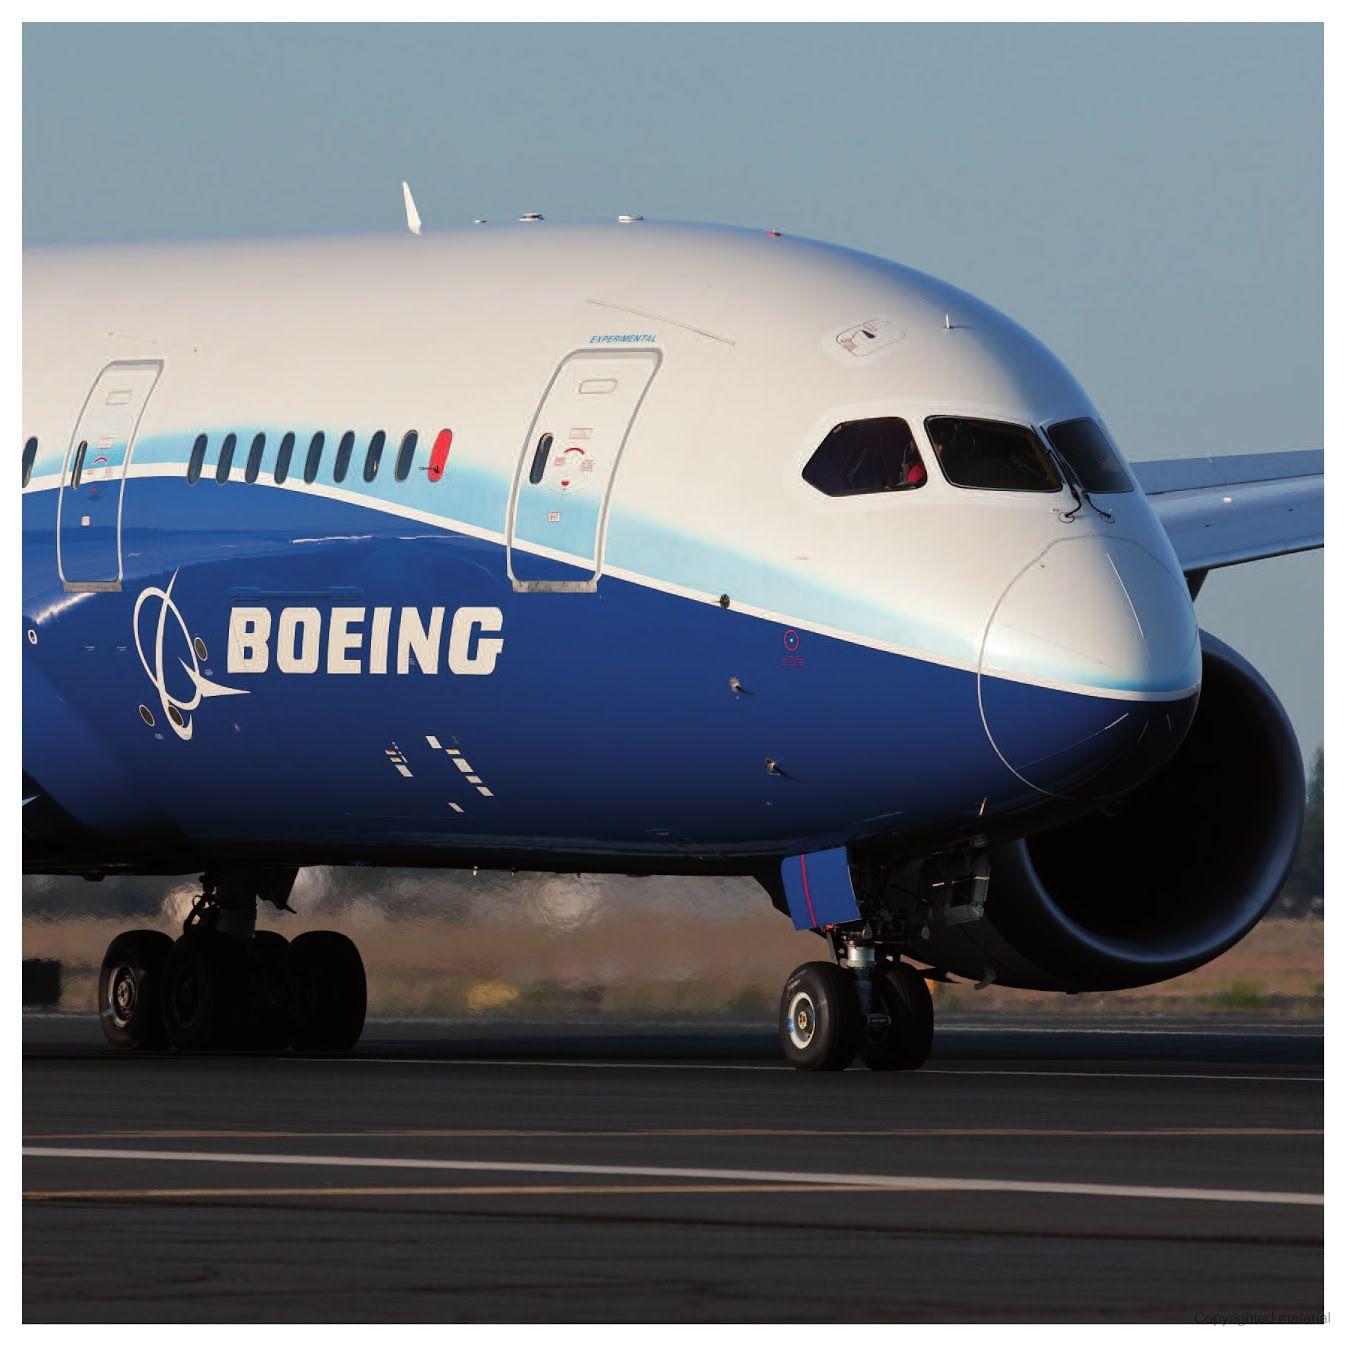 The Birth Of The 787 Dreamliner Edgar Turner Google Books Aviation History Boeing Stunning Photography